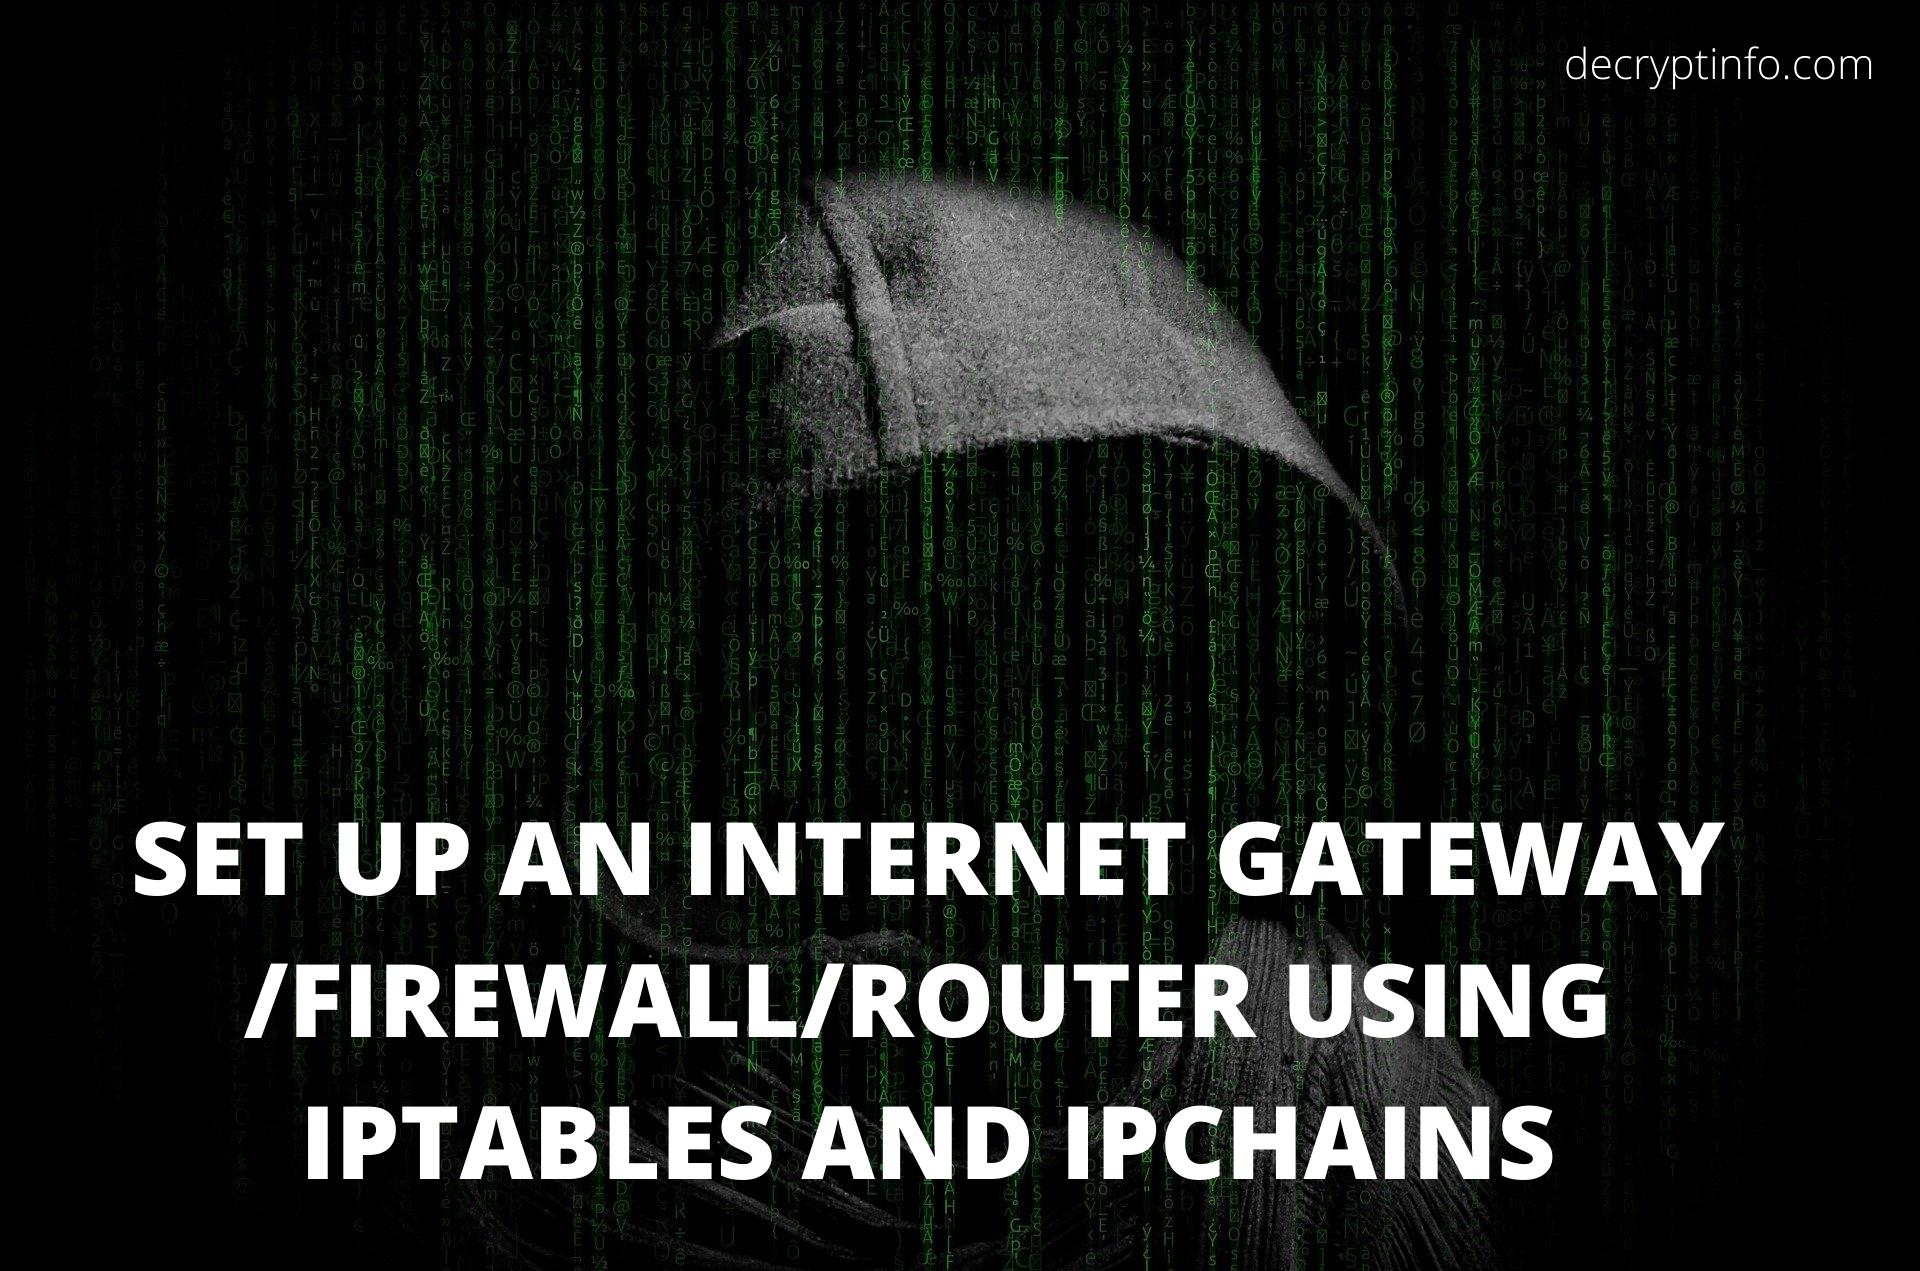 firewall-decryptinfo